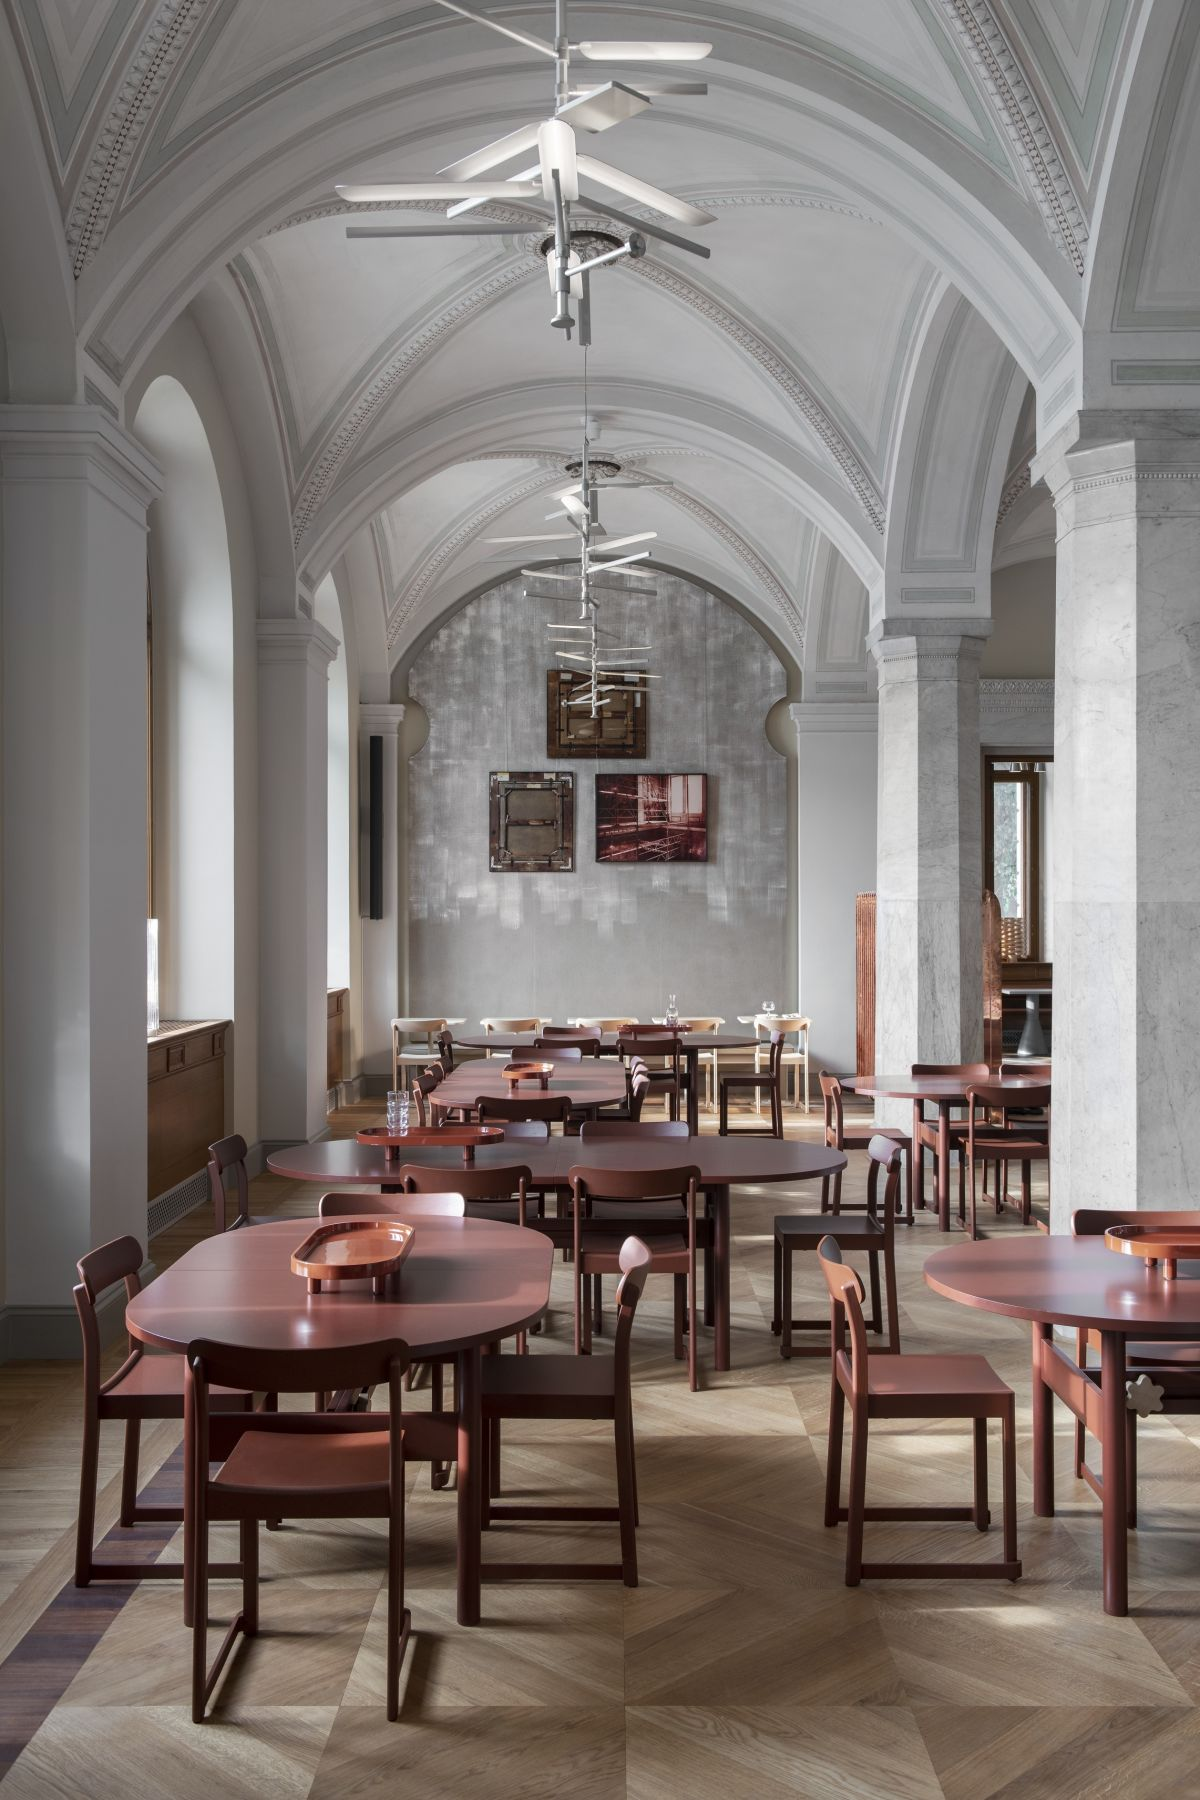 Artek Atelier Chair Nationalmuseum 1Restaurant Photo Erik Lefvander